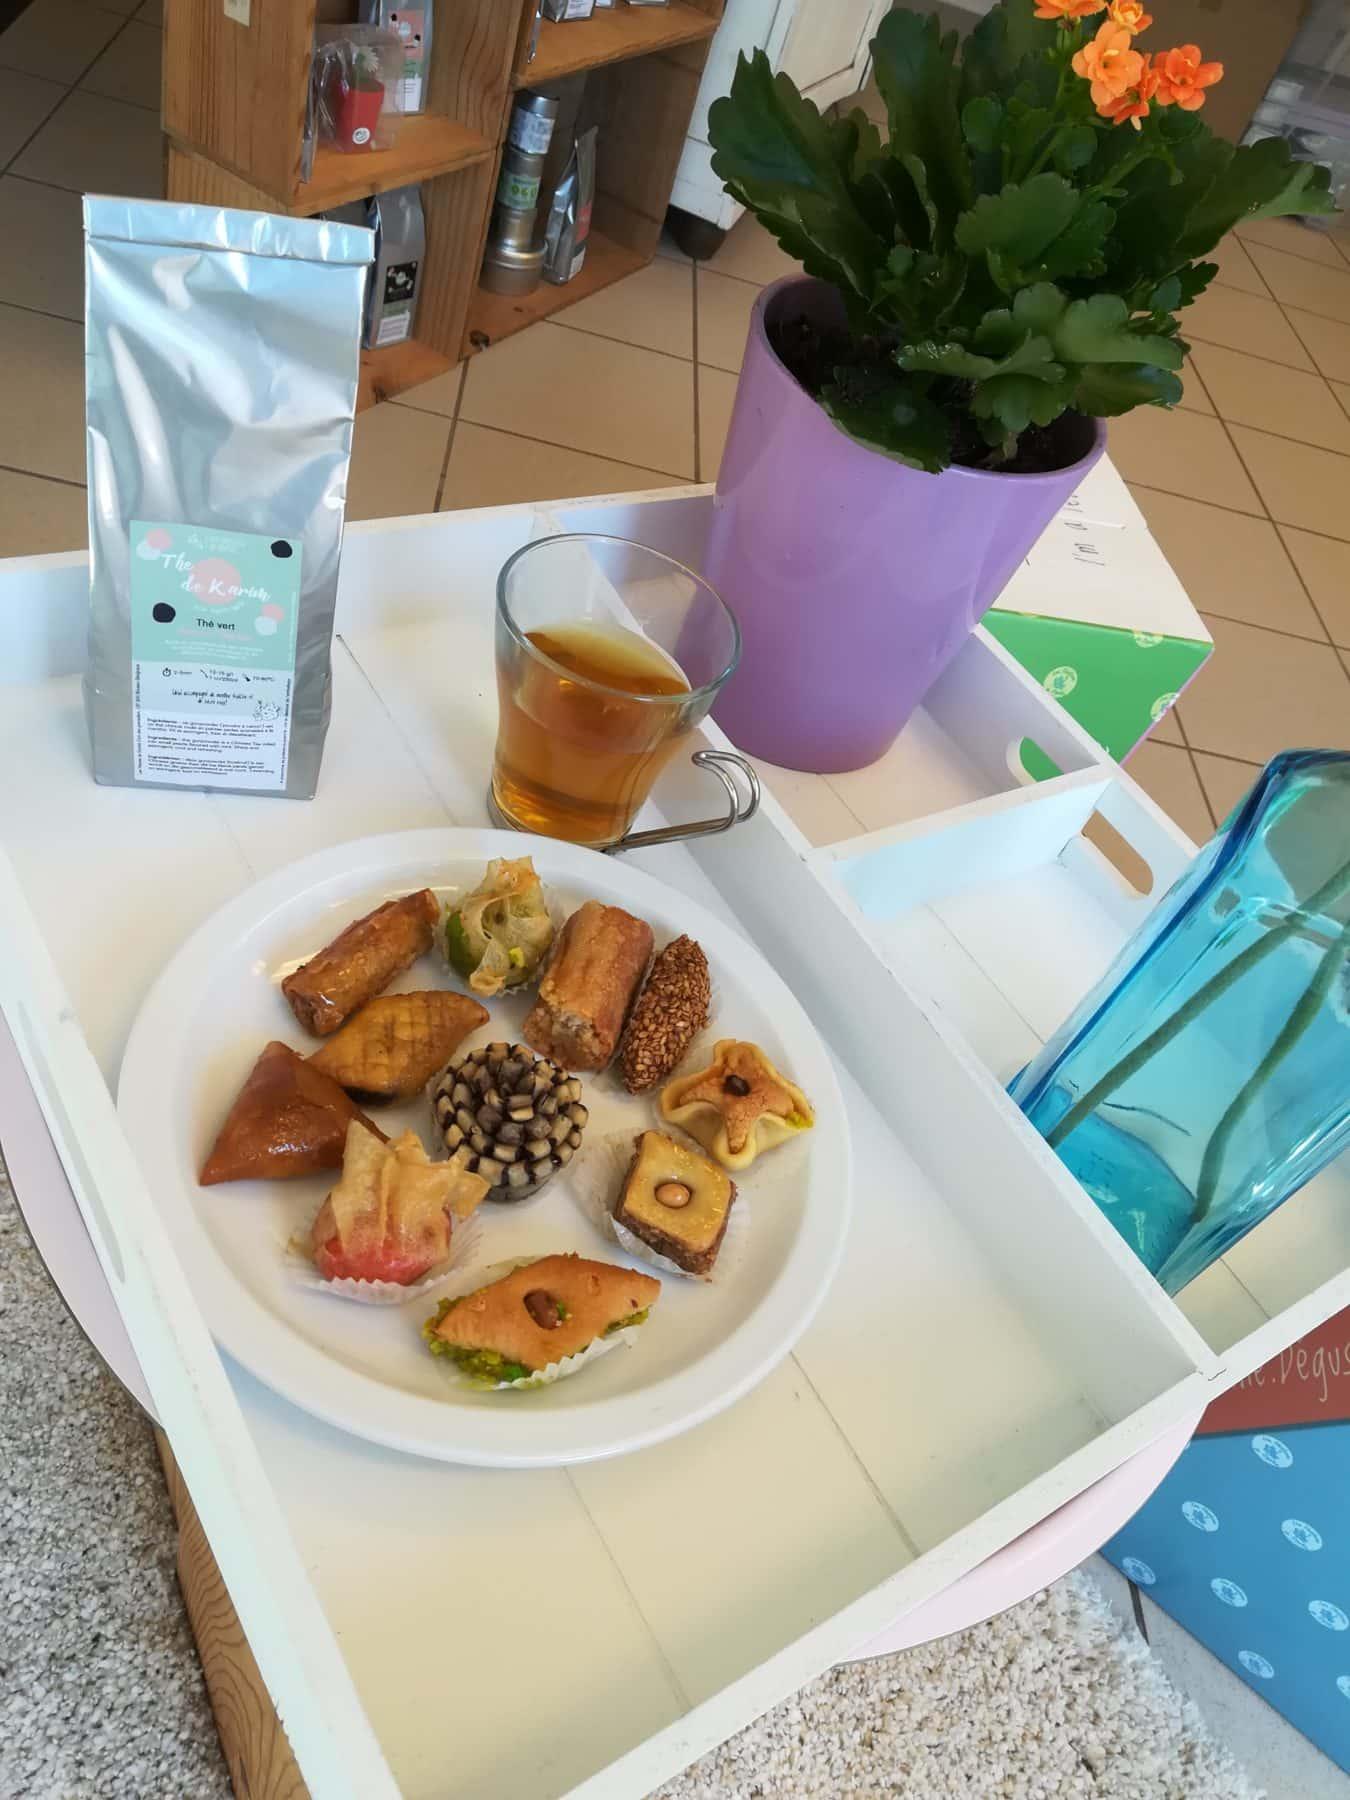 Thé vert à la menthe: Karim